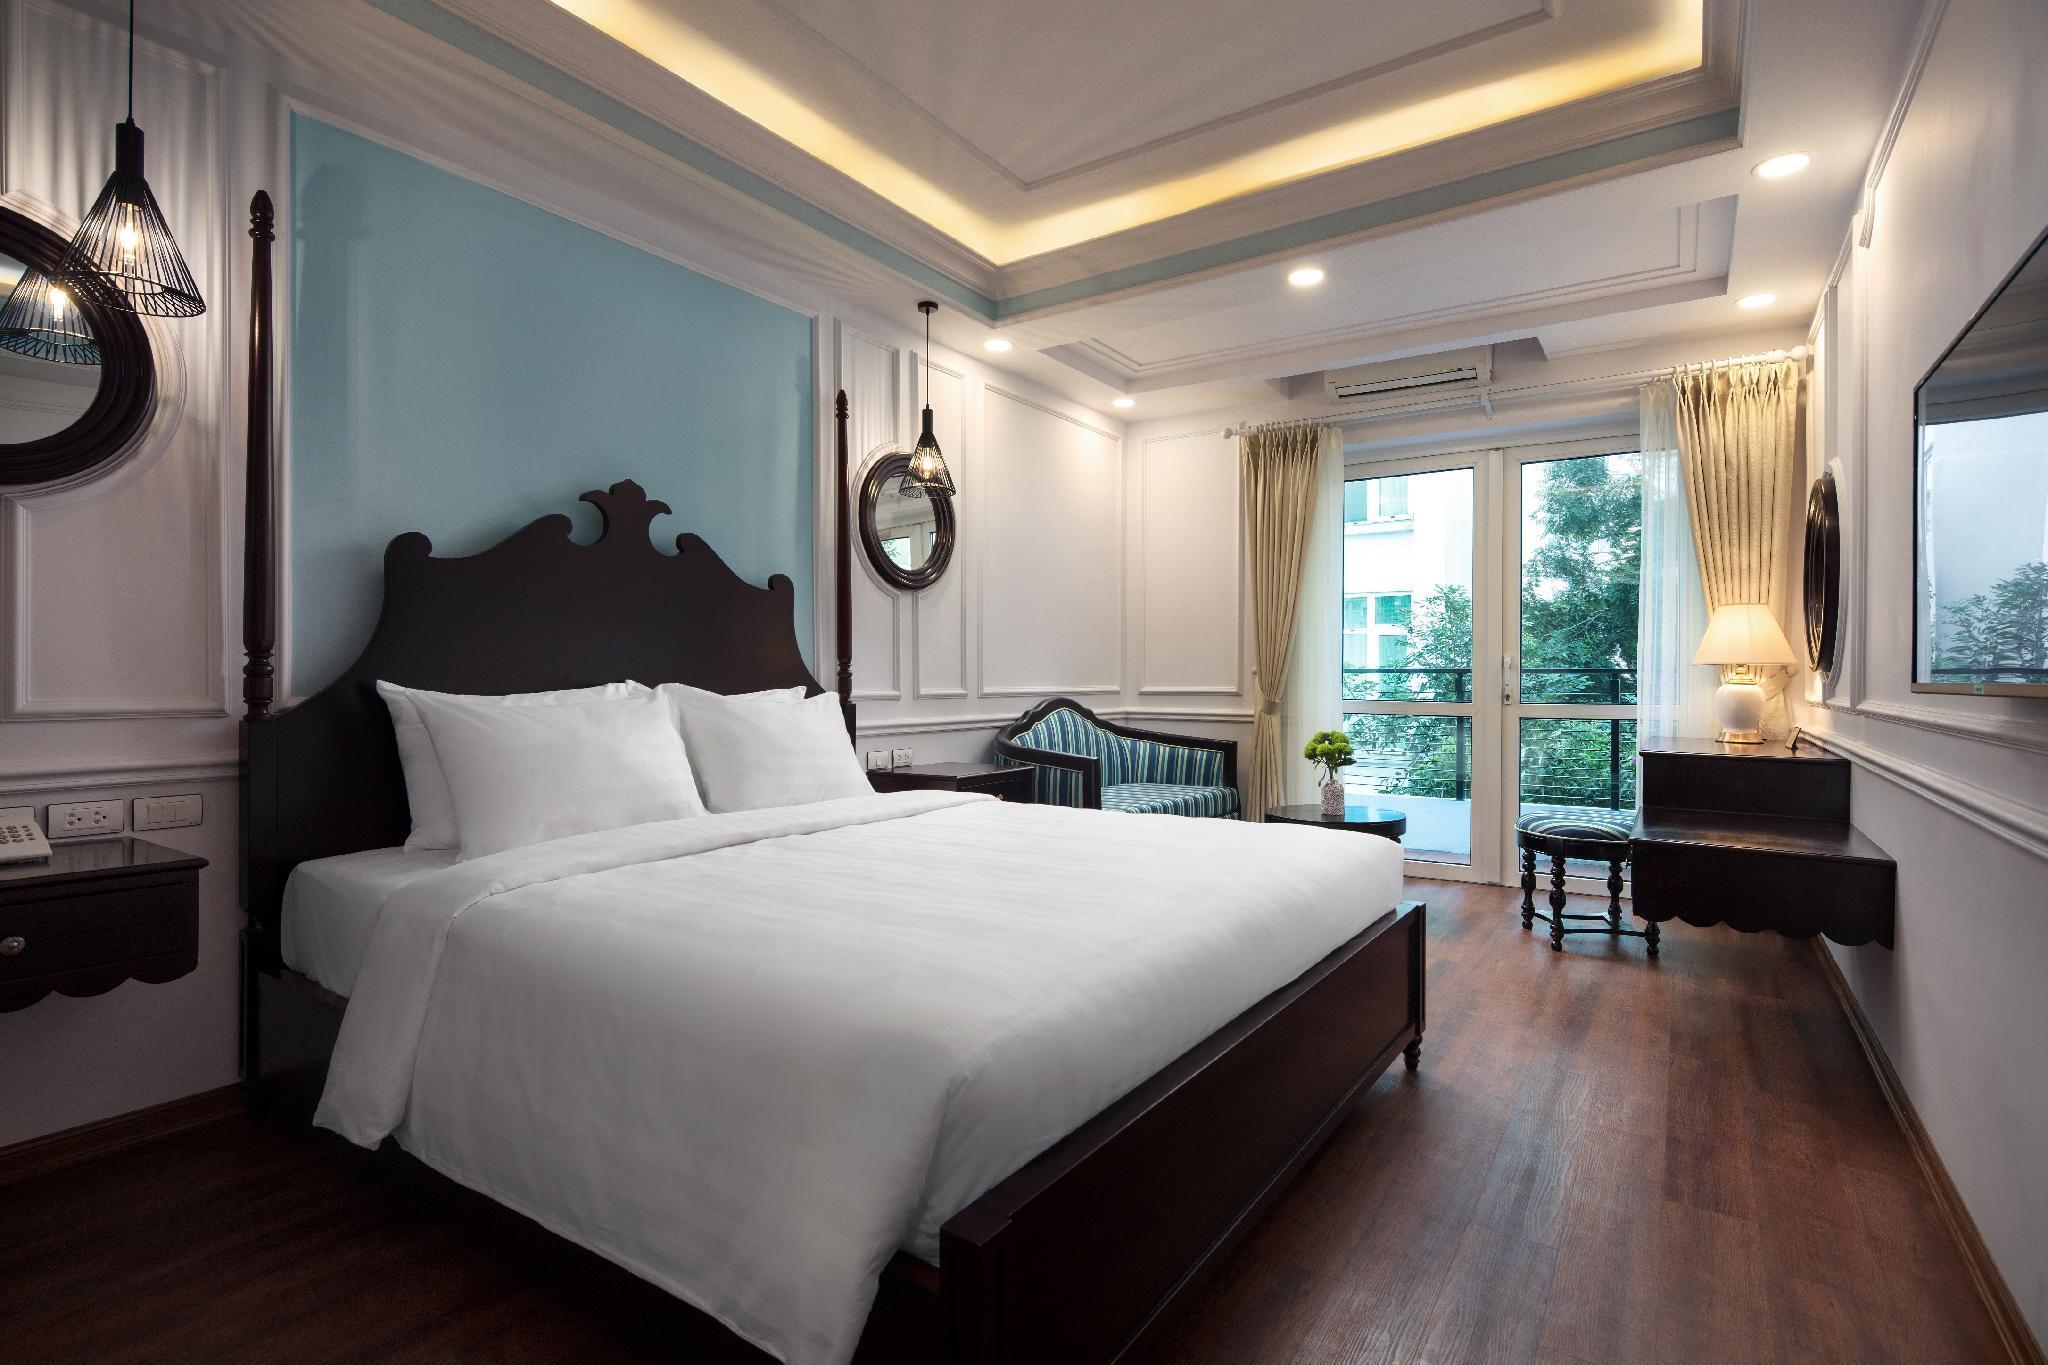 La Paix Hotel